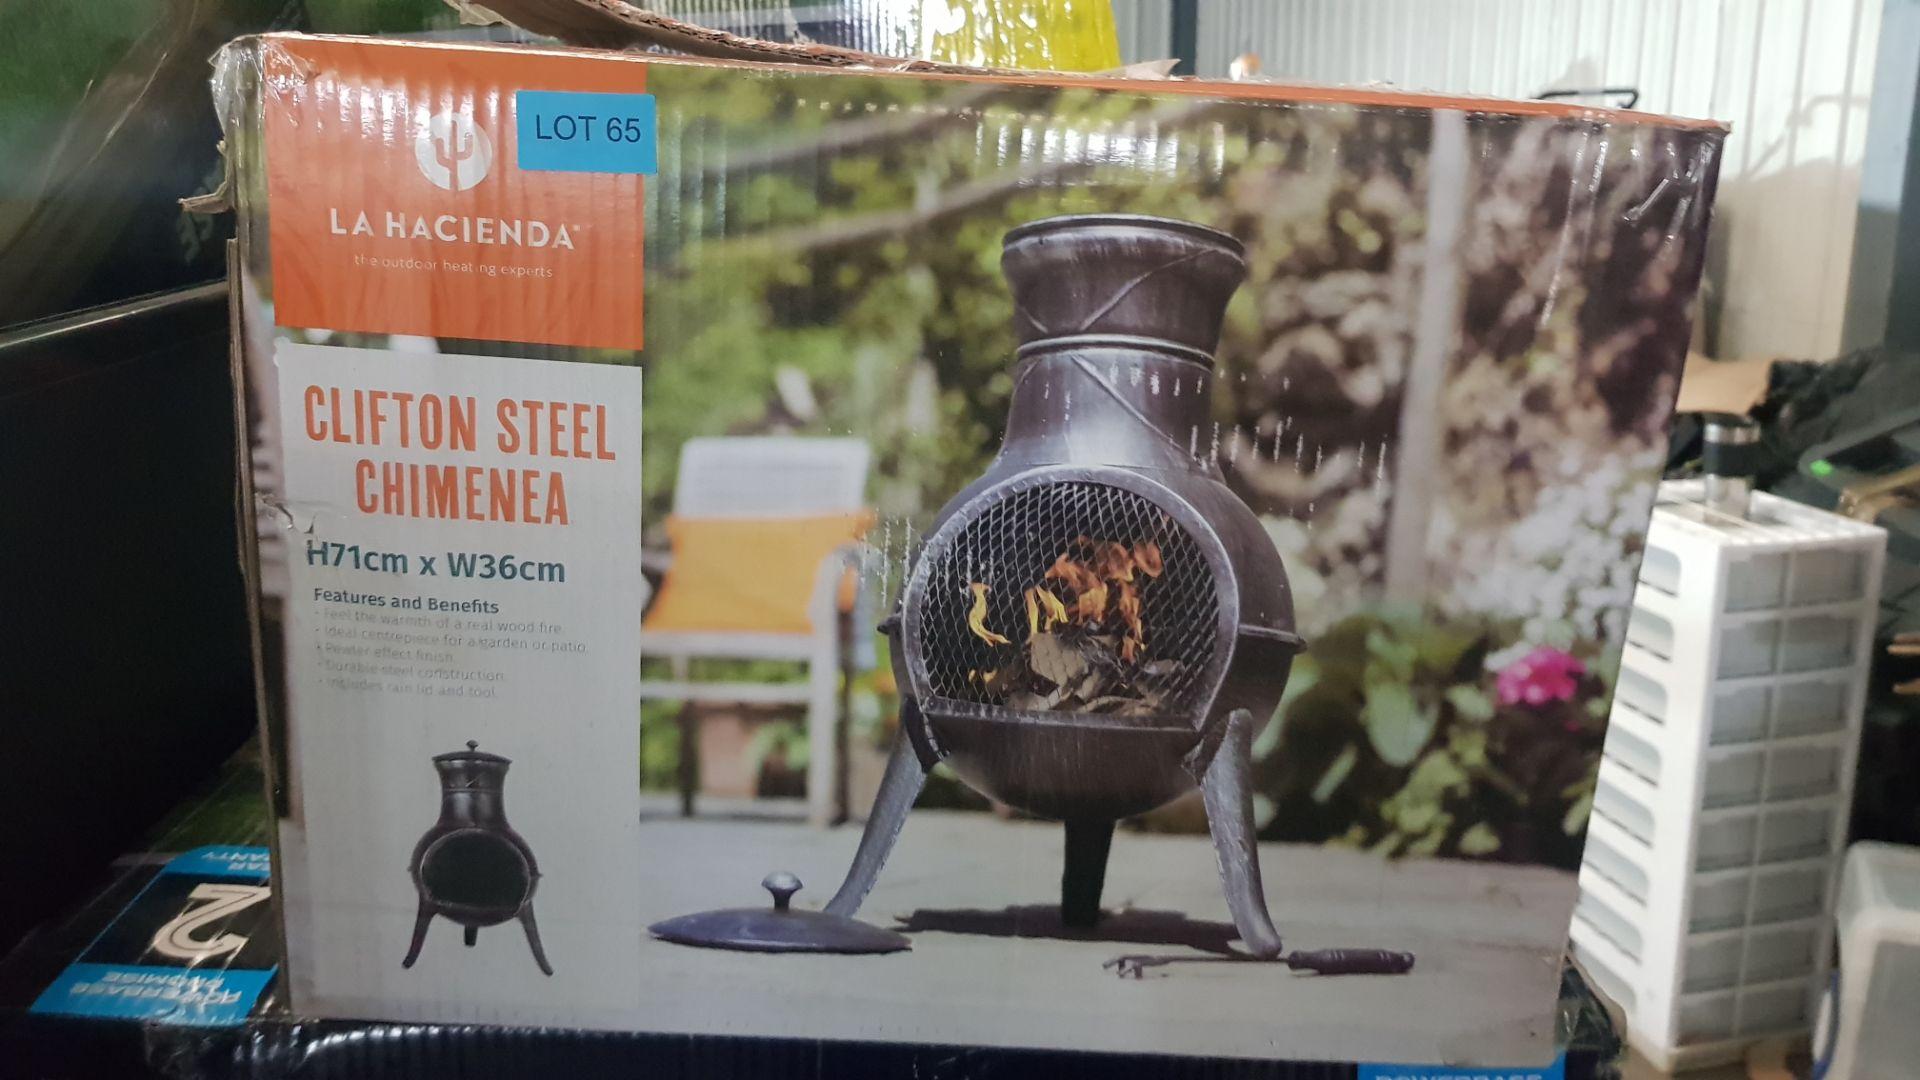 (P5) 1x La Hacienda Clifton Steel Chimenea (H71x W36cm) - Image 2 of 2